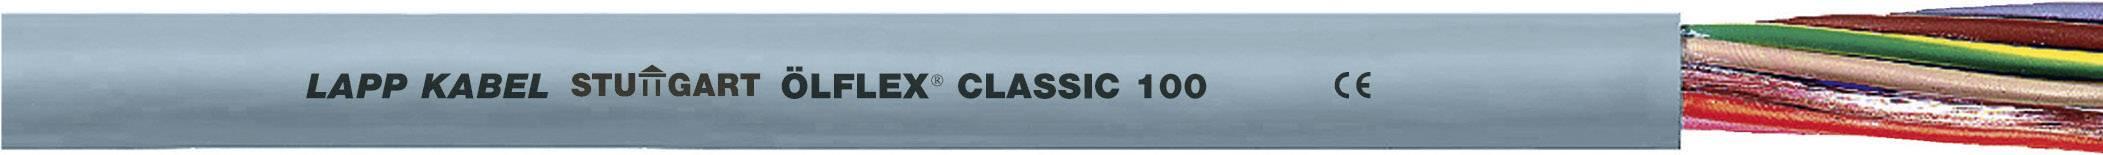 Kabel LappKabel Ölflex CLASSIC 100 7G2,5 (0010091), PVC, 13,1 mm, 750 V, šedá, 50 m